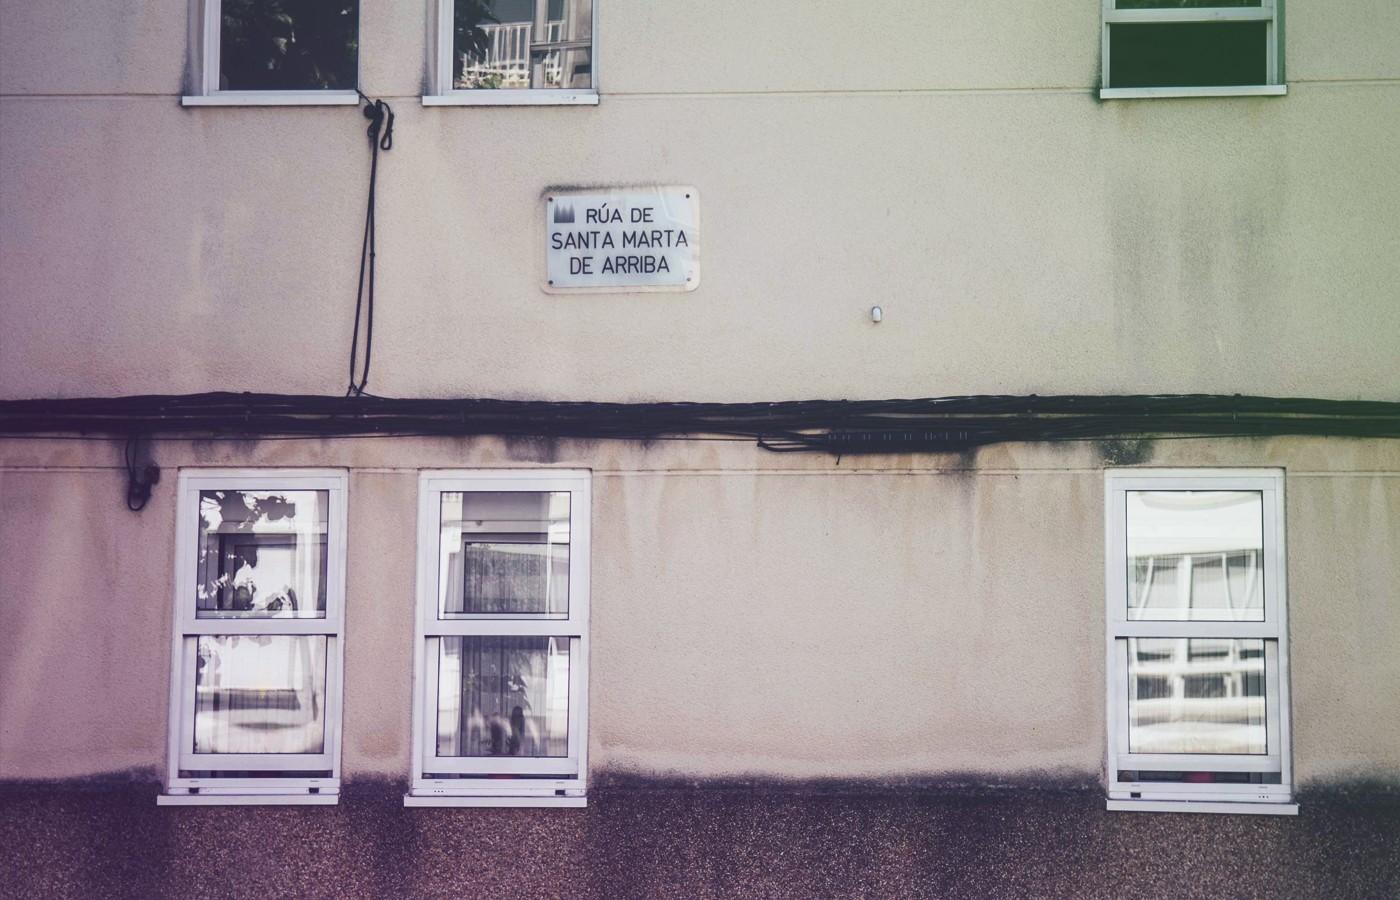 tm_compostela_toponimia_urbana_02